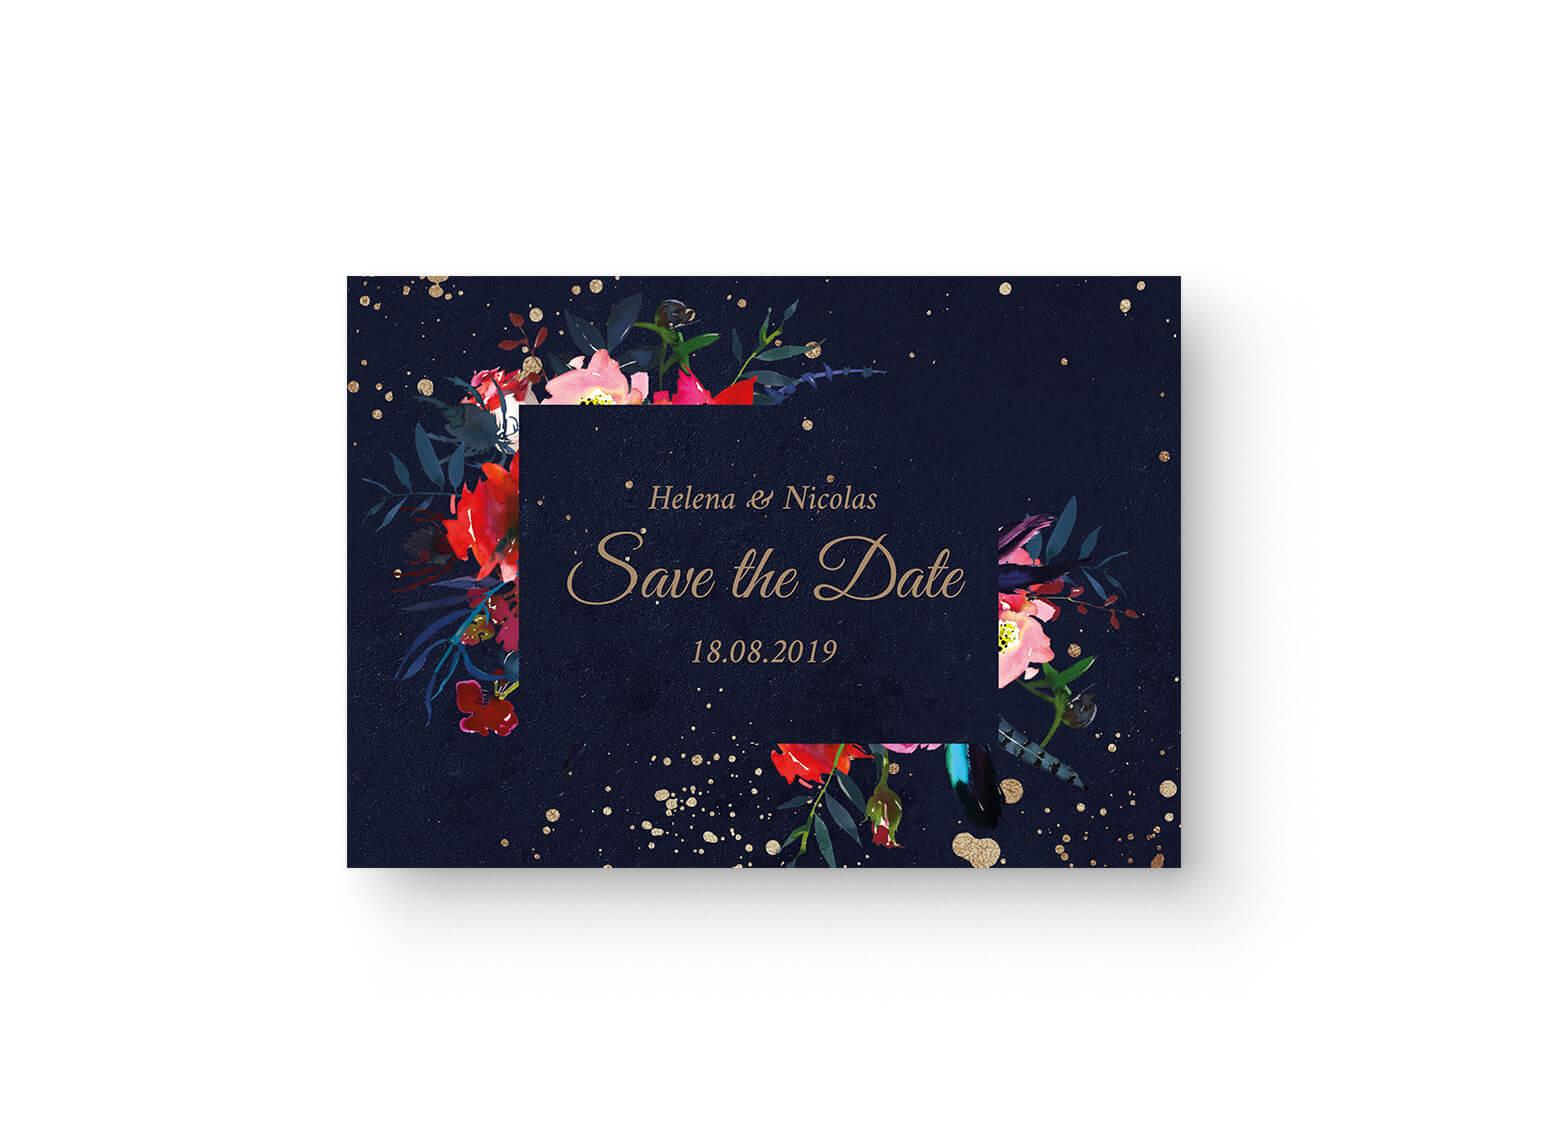 save-the-date-postkarte-dunkel-blau-beerentoene-blumen-aquarell-gold-front_MP0001-1.0.2